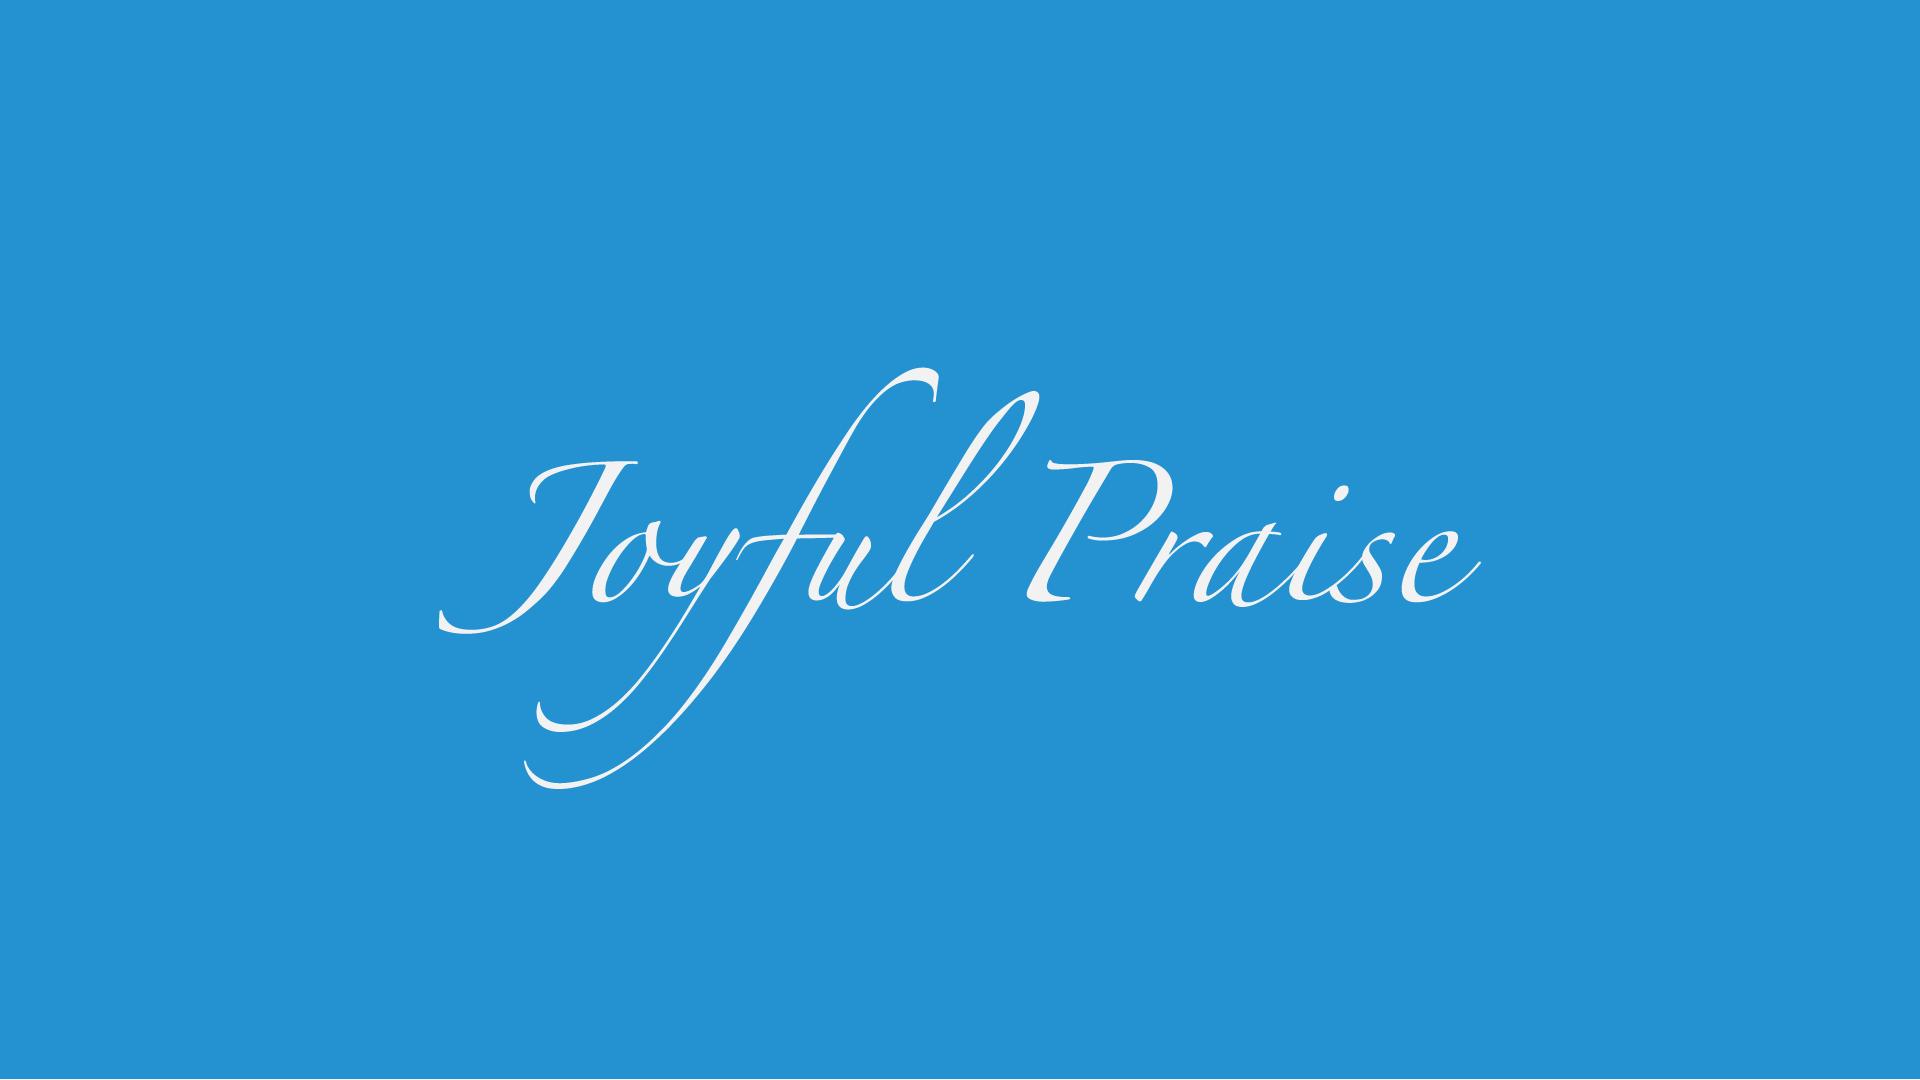 Women's Praise & Worship Ensemble.  1st & 3rd Wednesday, 8:30 pm (Choir Room)